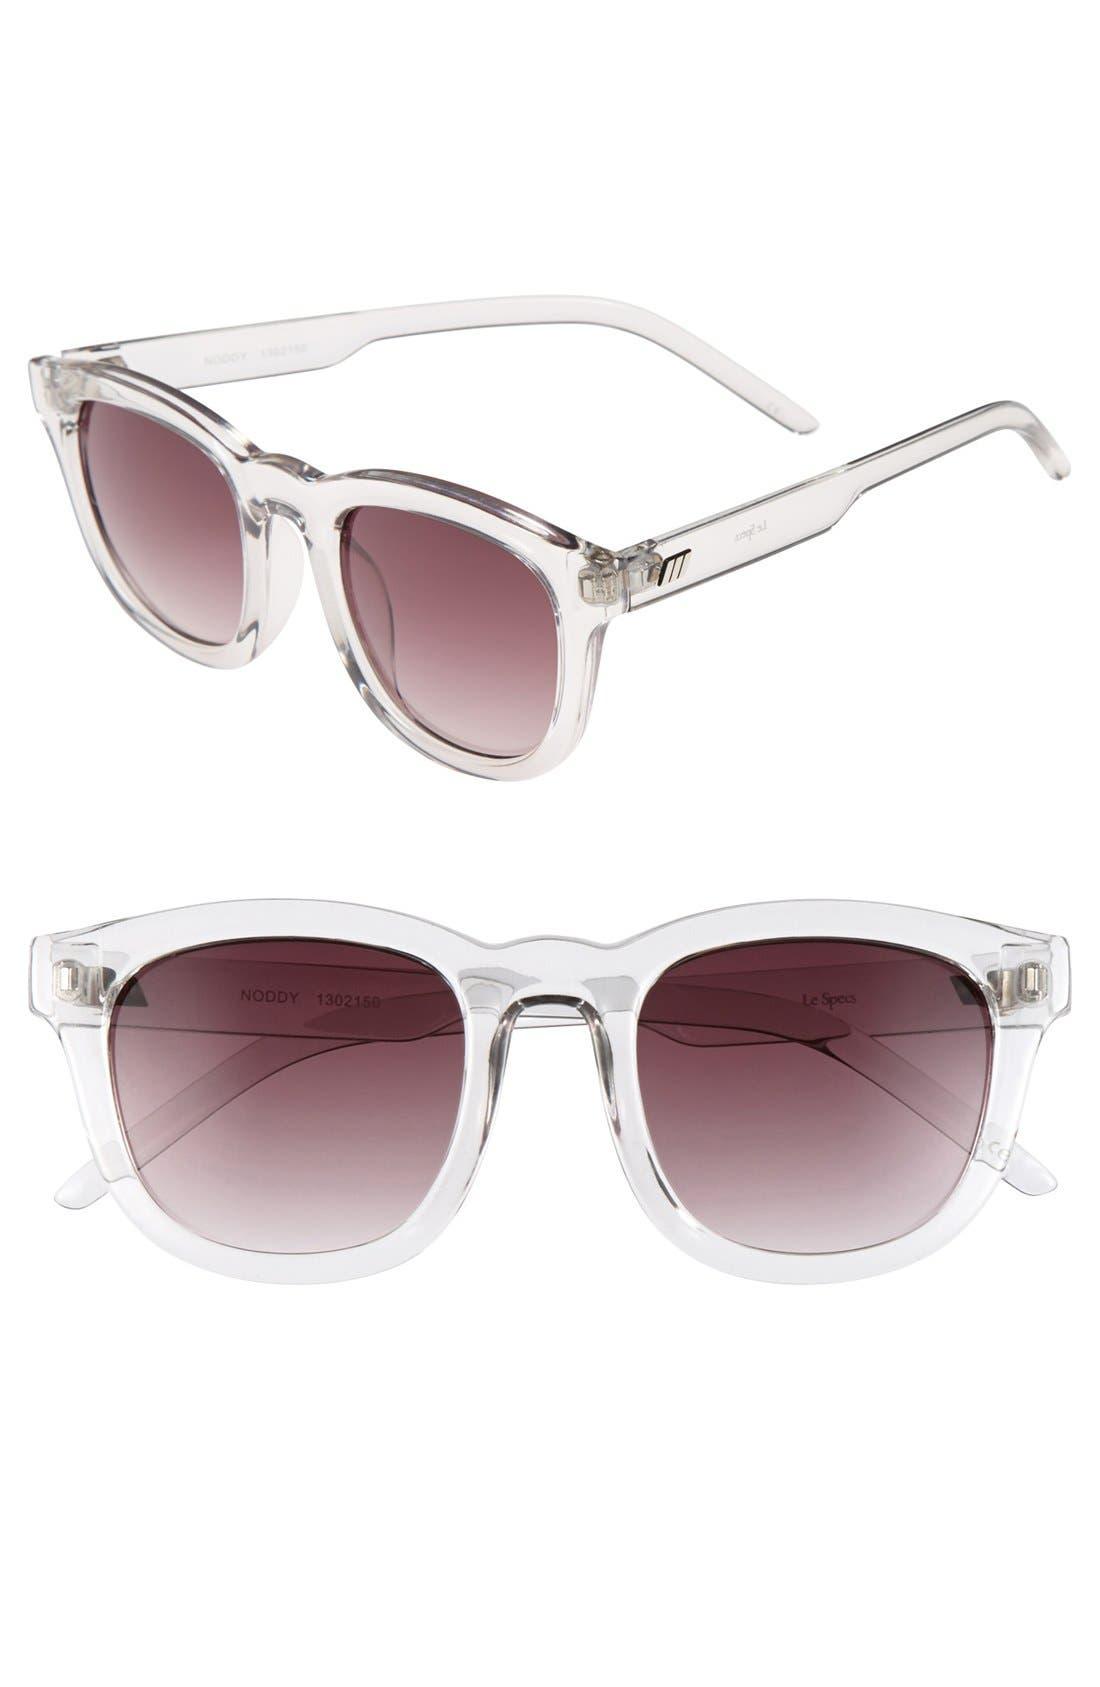 Main Image - Le Specs 'Noddy' 49mm Retro Sunglasses